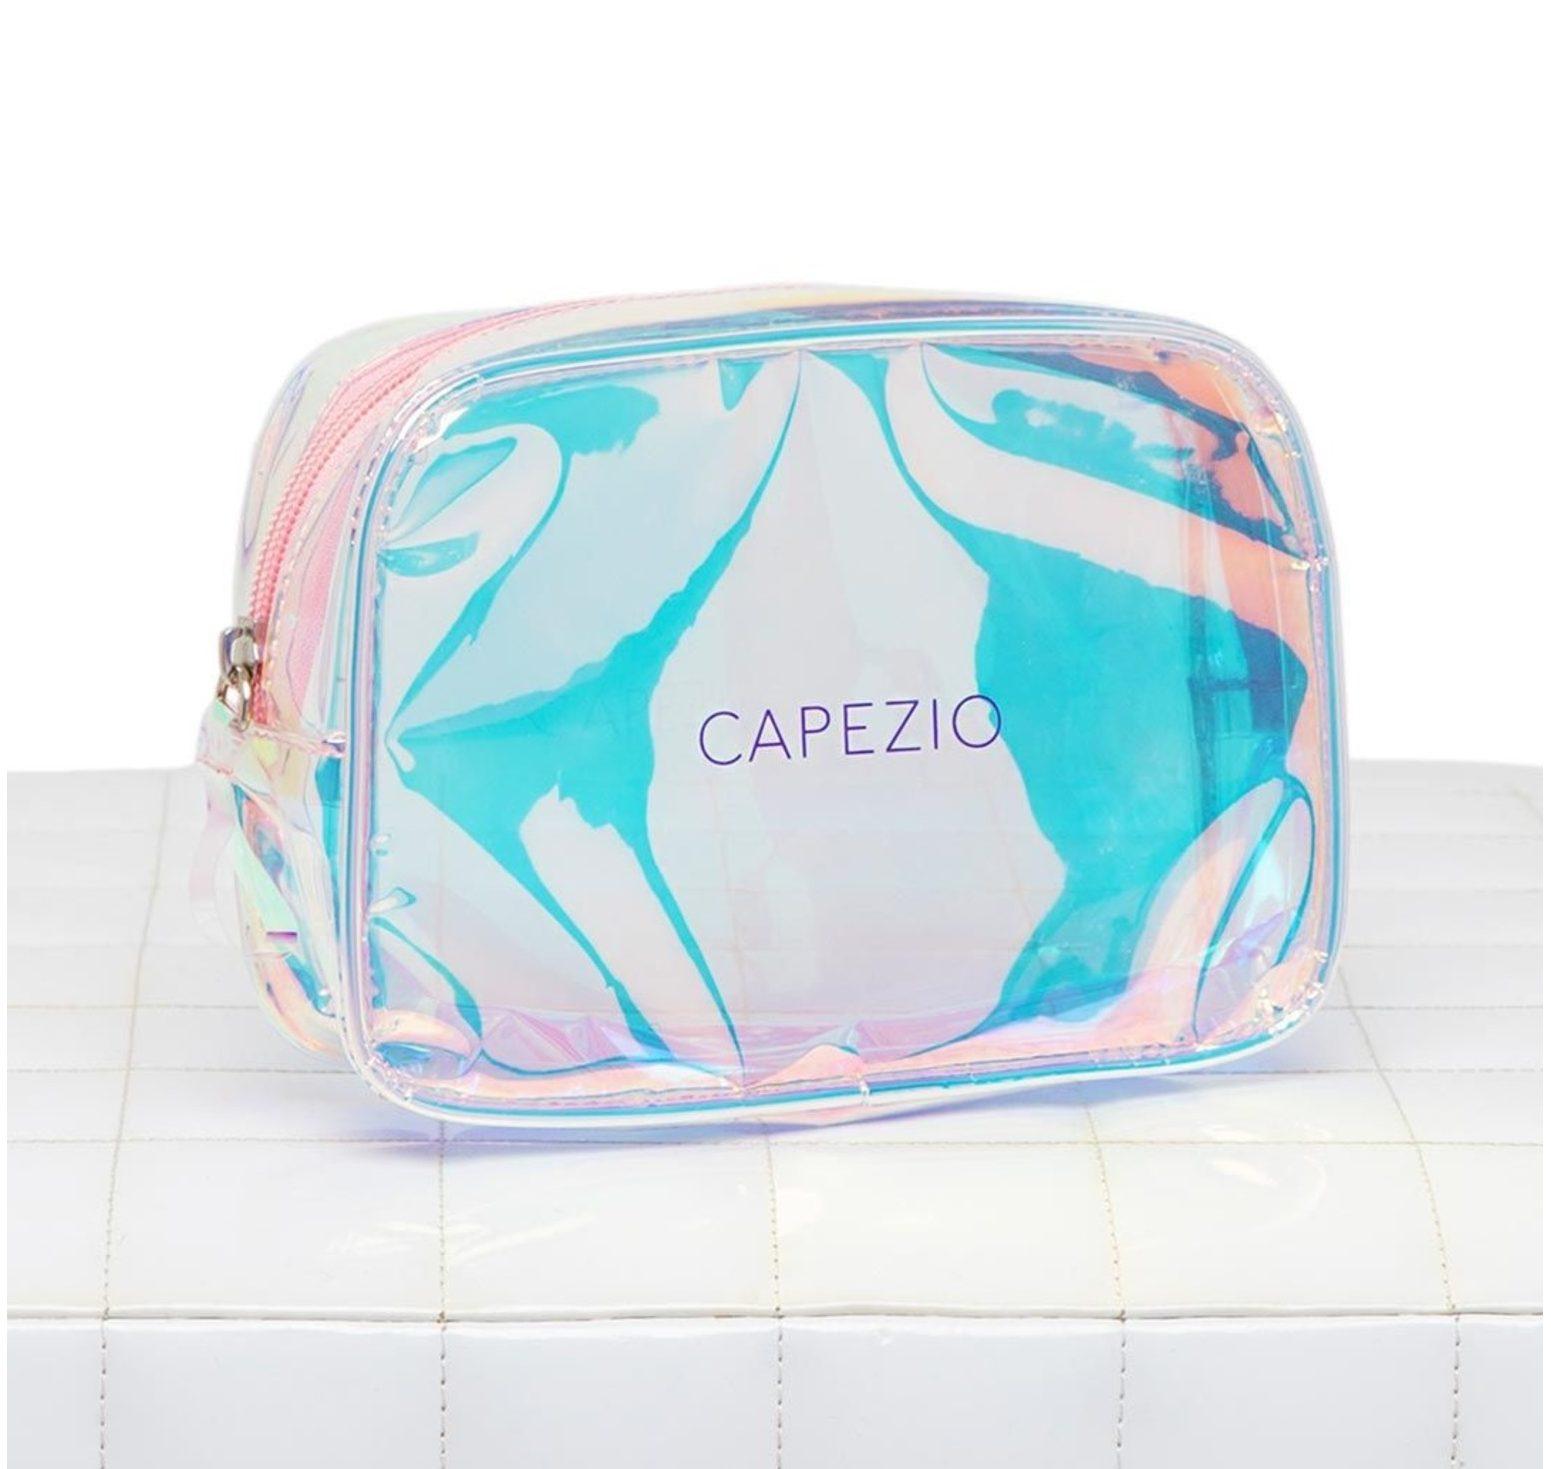 Capezio B226 holografisch make-up tasje